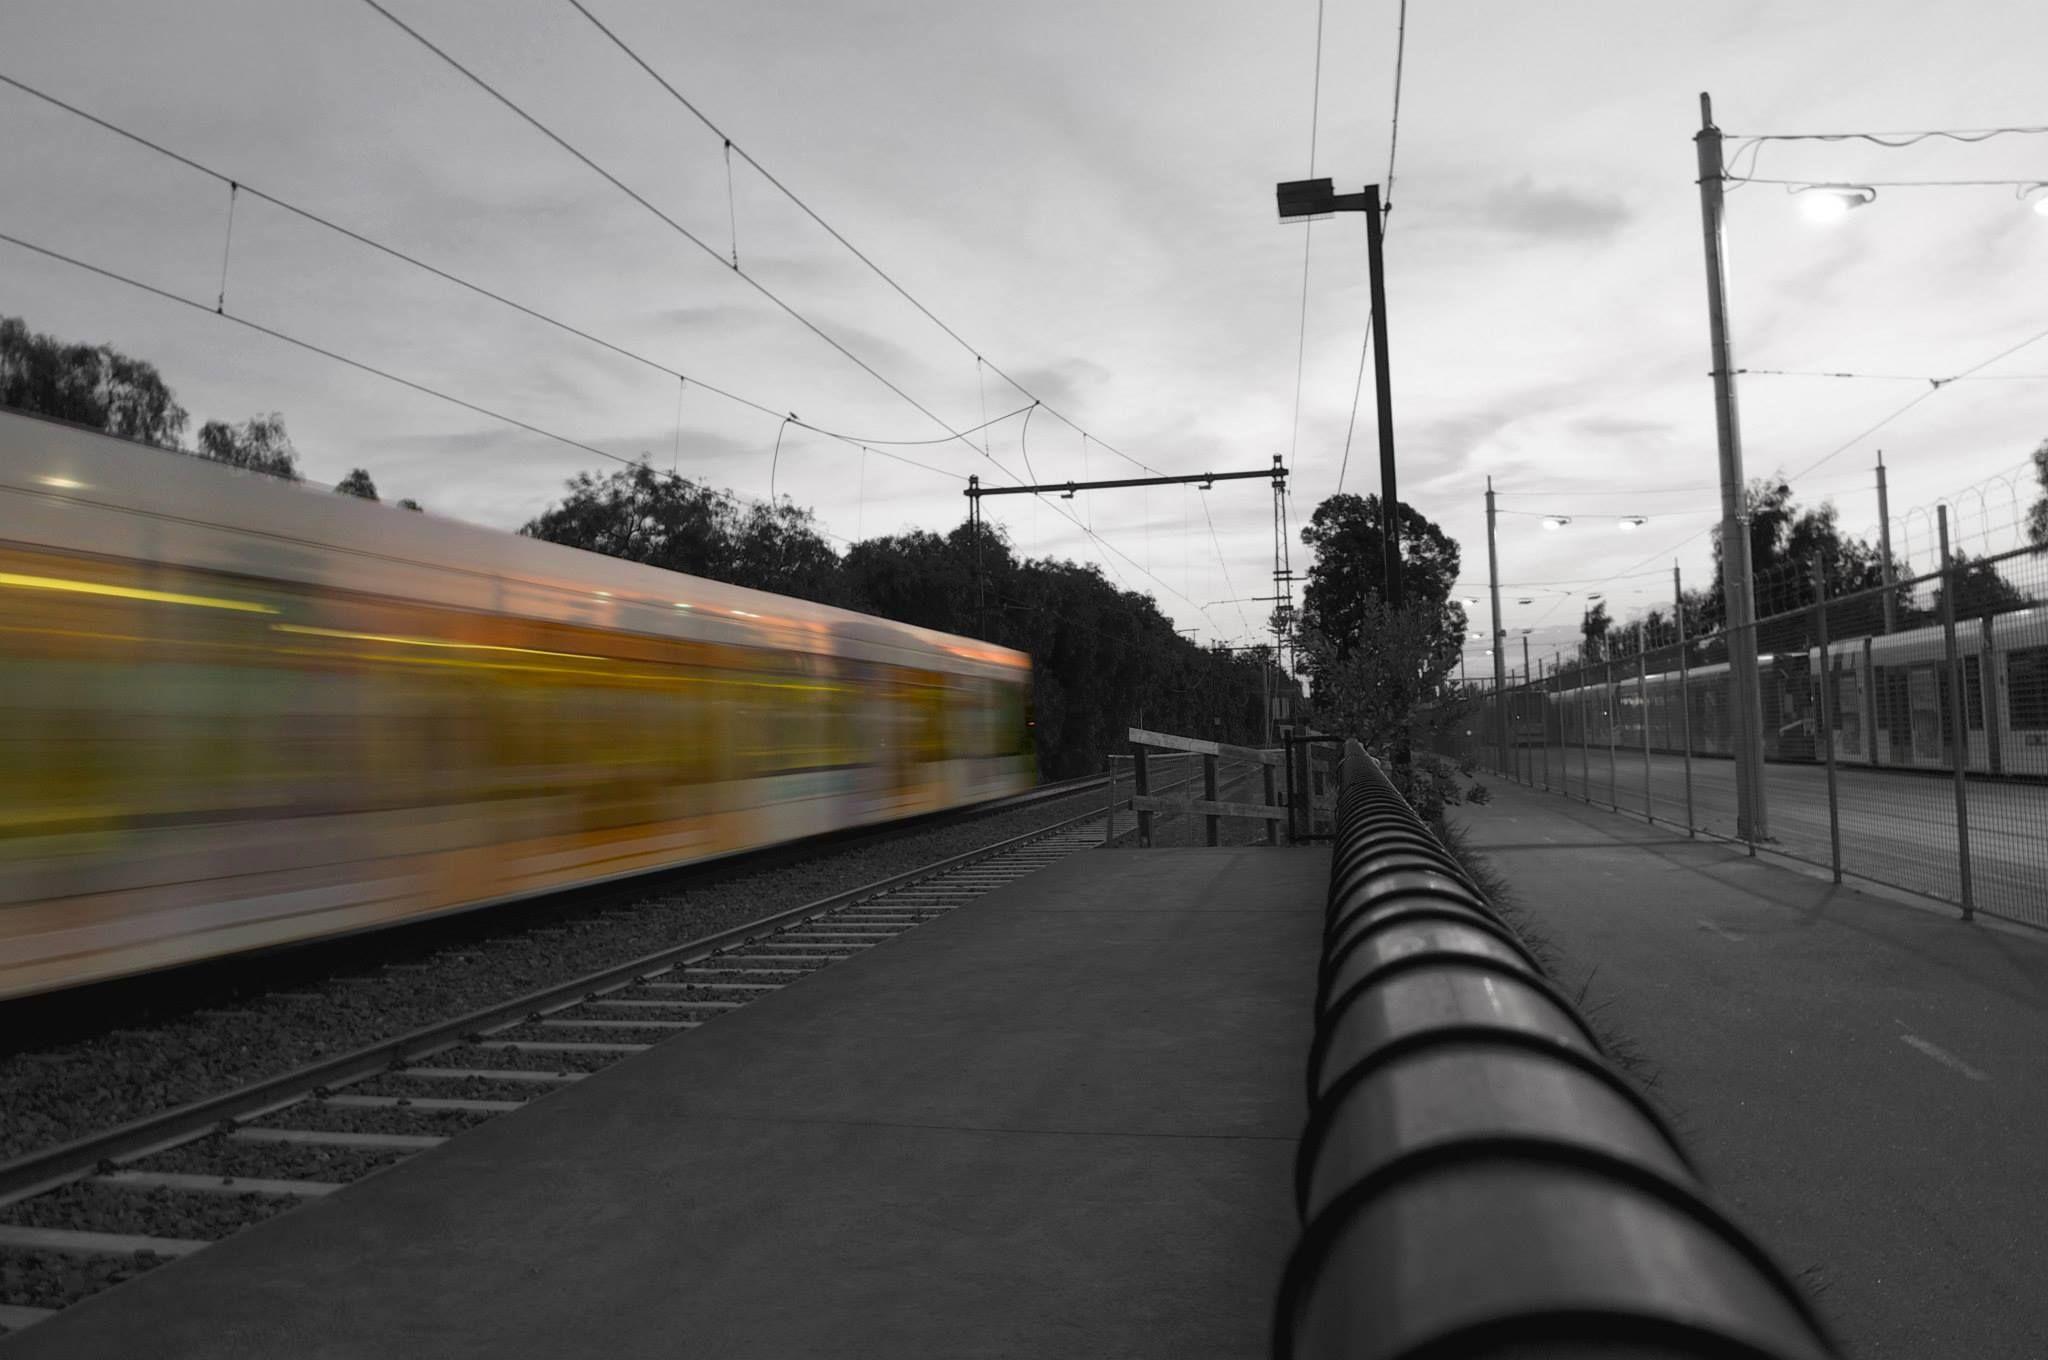 Route 109 Tram, Melbourne Australia. © Scott Wright